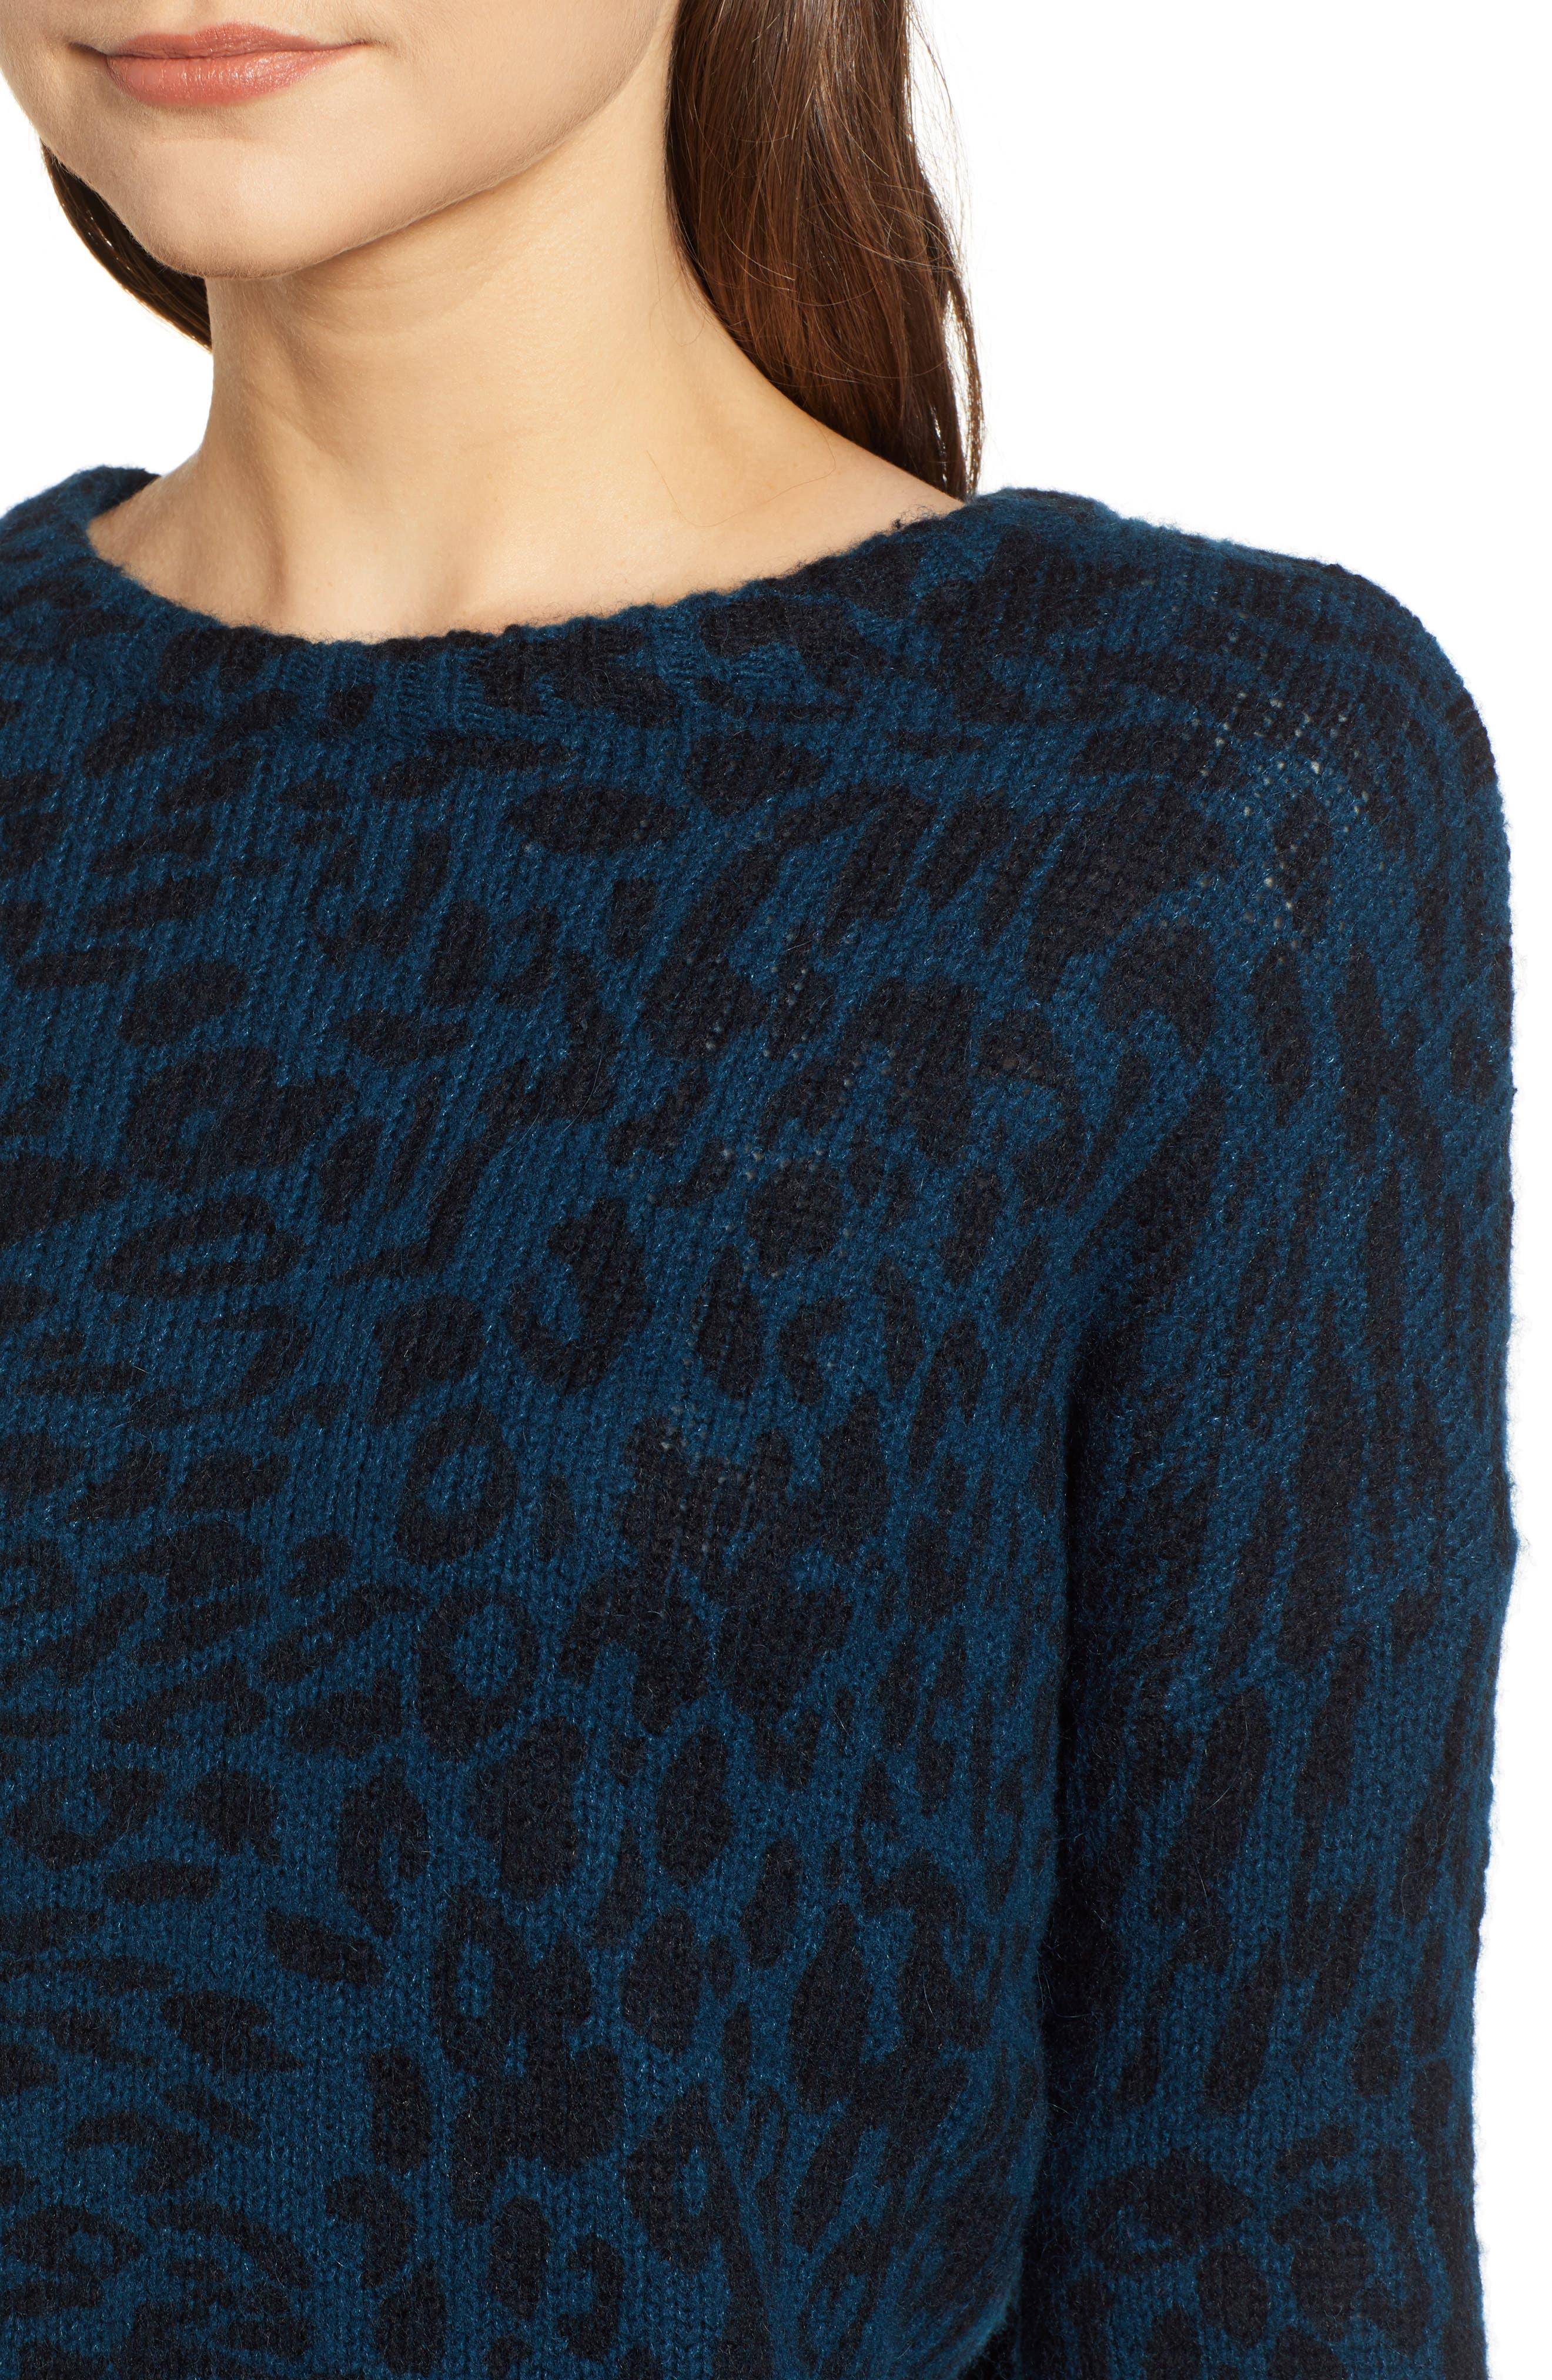 Donovan Animal Print Sweater,                             Alternate thumbnail 4, color,                             BLUE LEOPARD